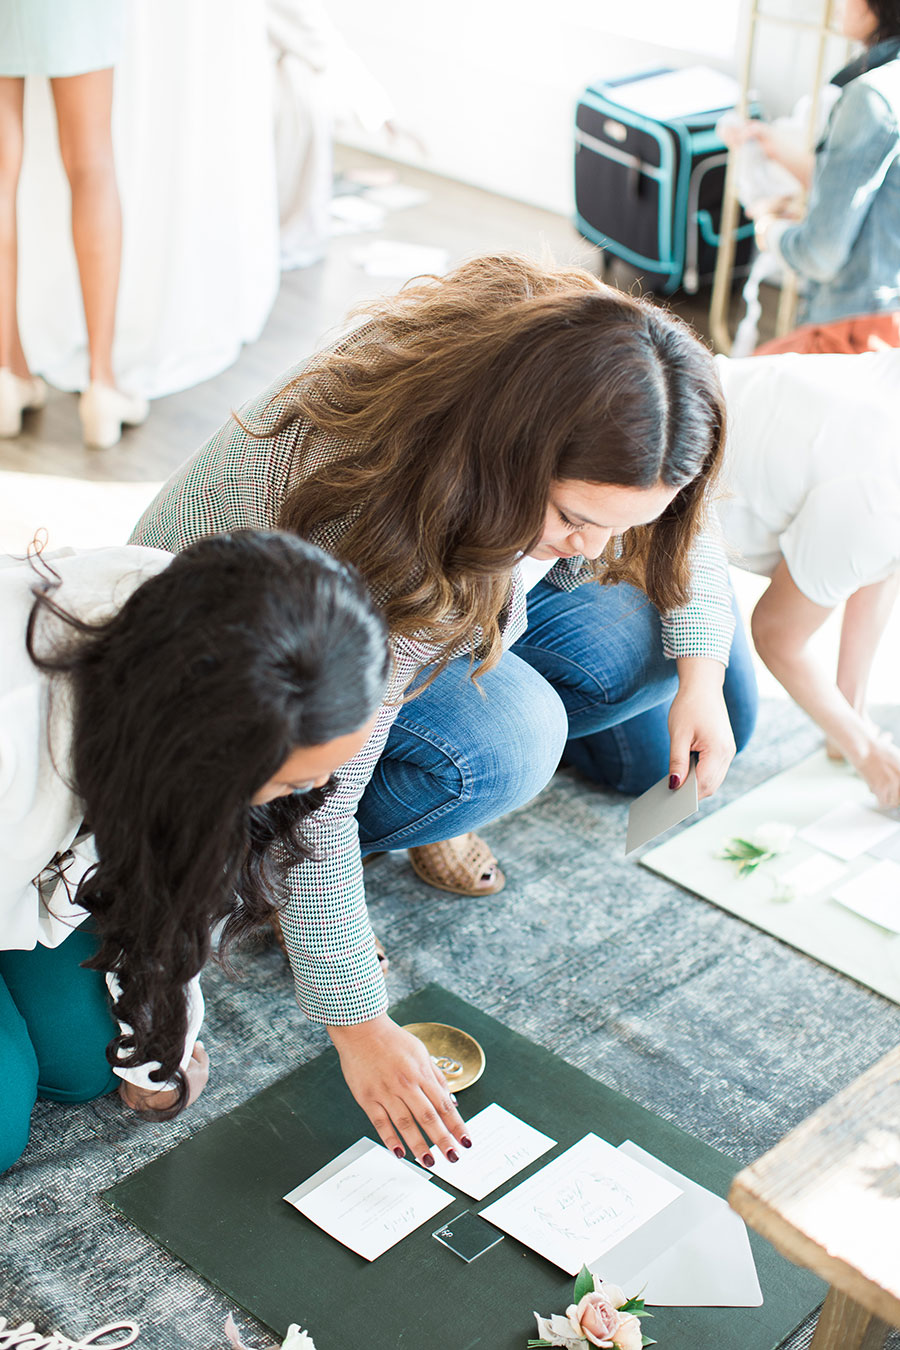 sourced-co-lvl-academy-wedding-planner-workshop-3.jpg